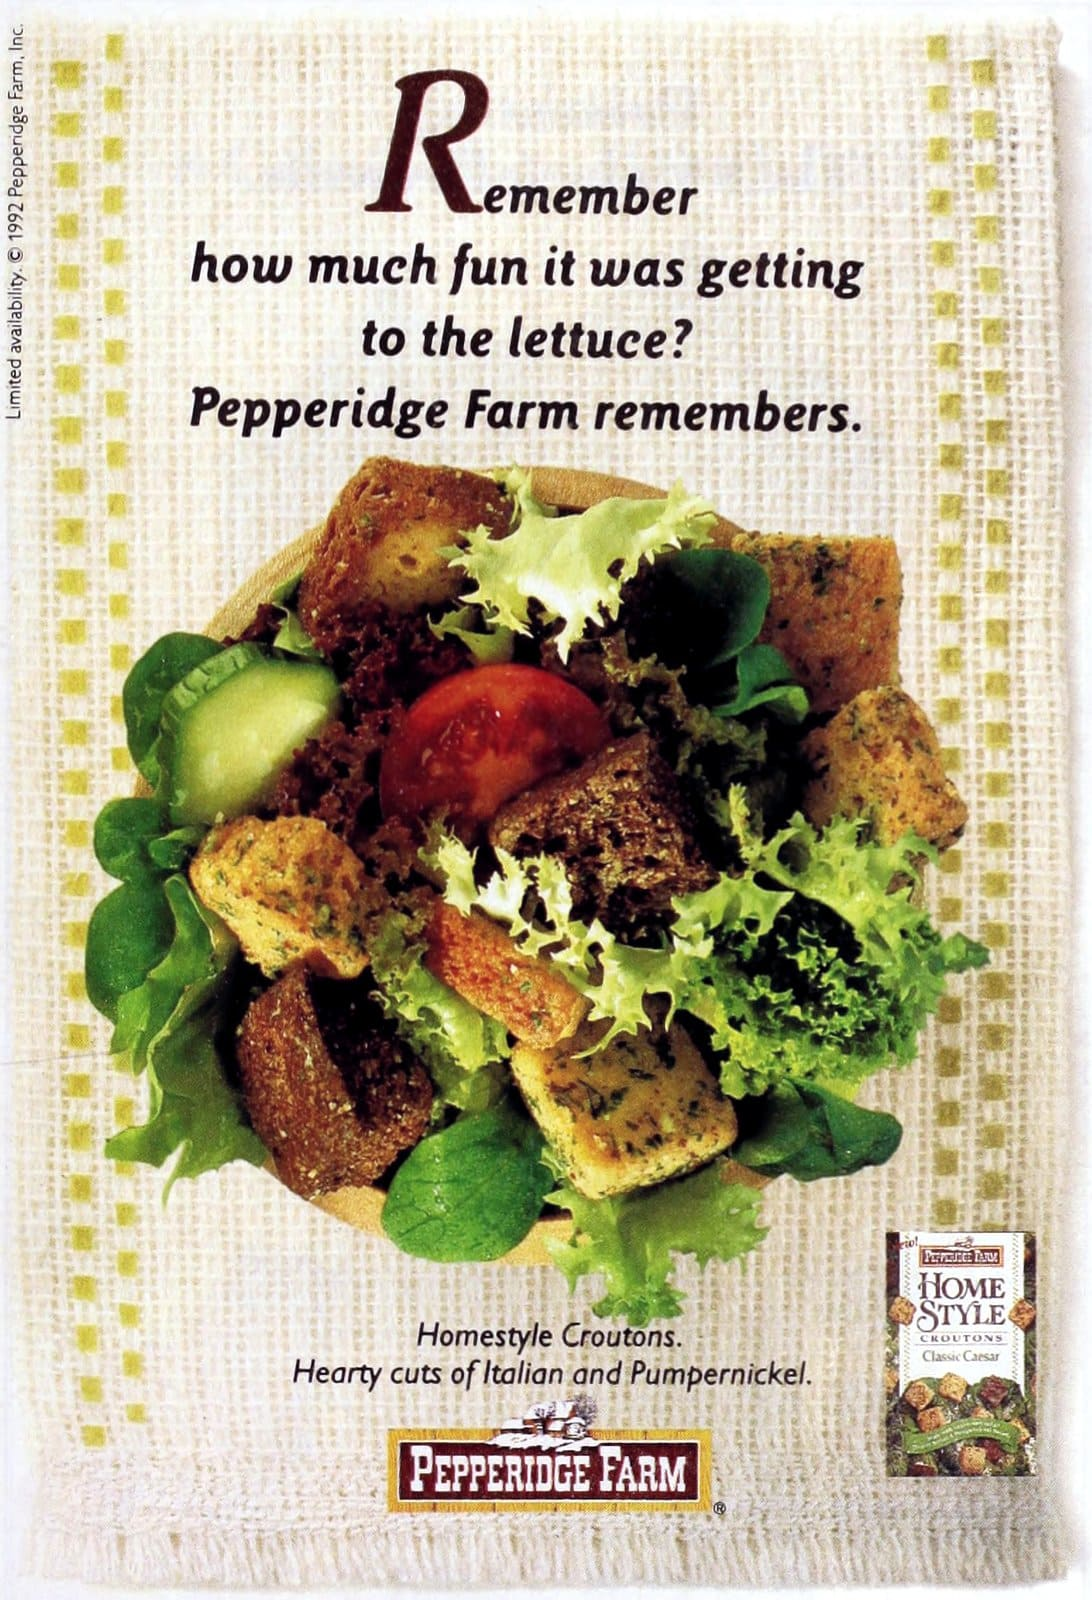 Pepperidge Farm croutons (1992)